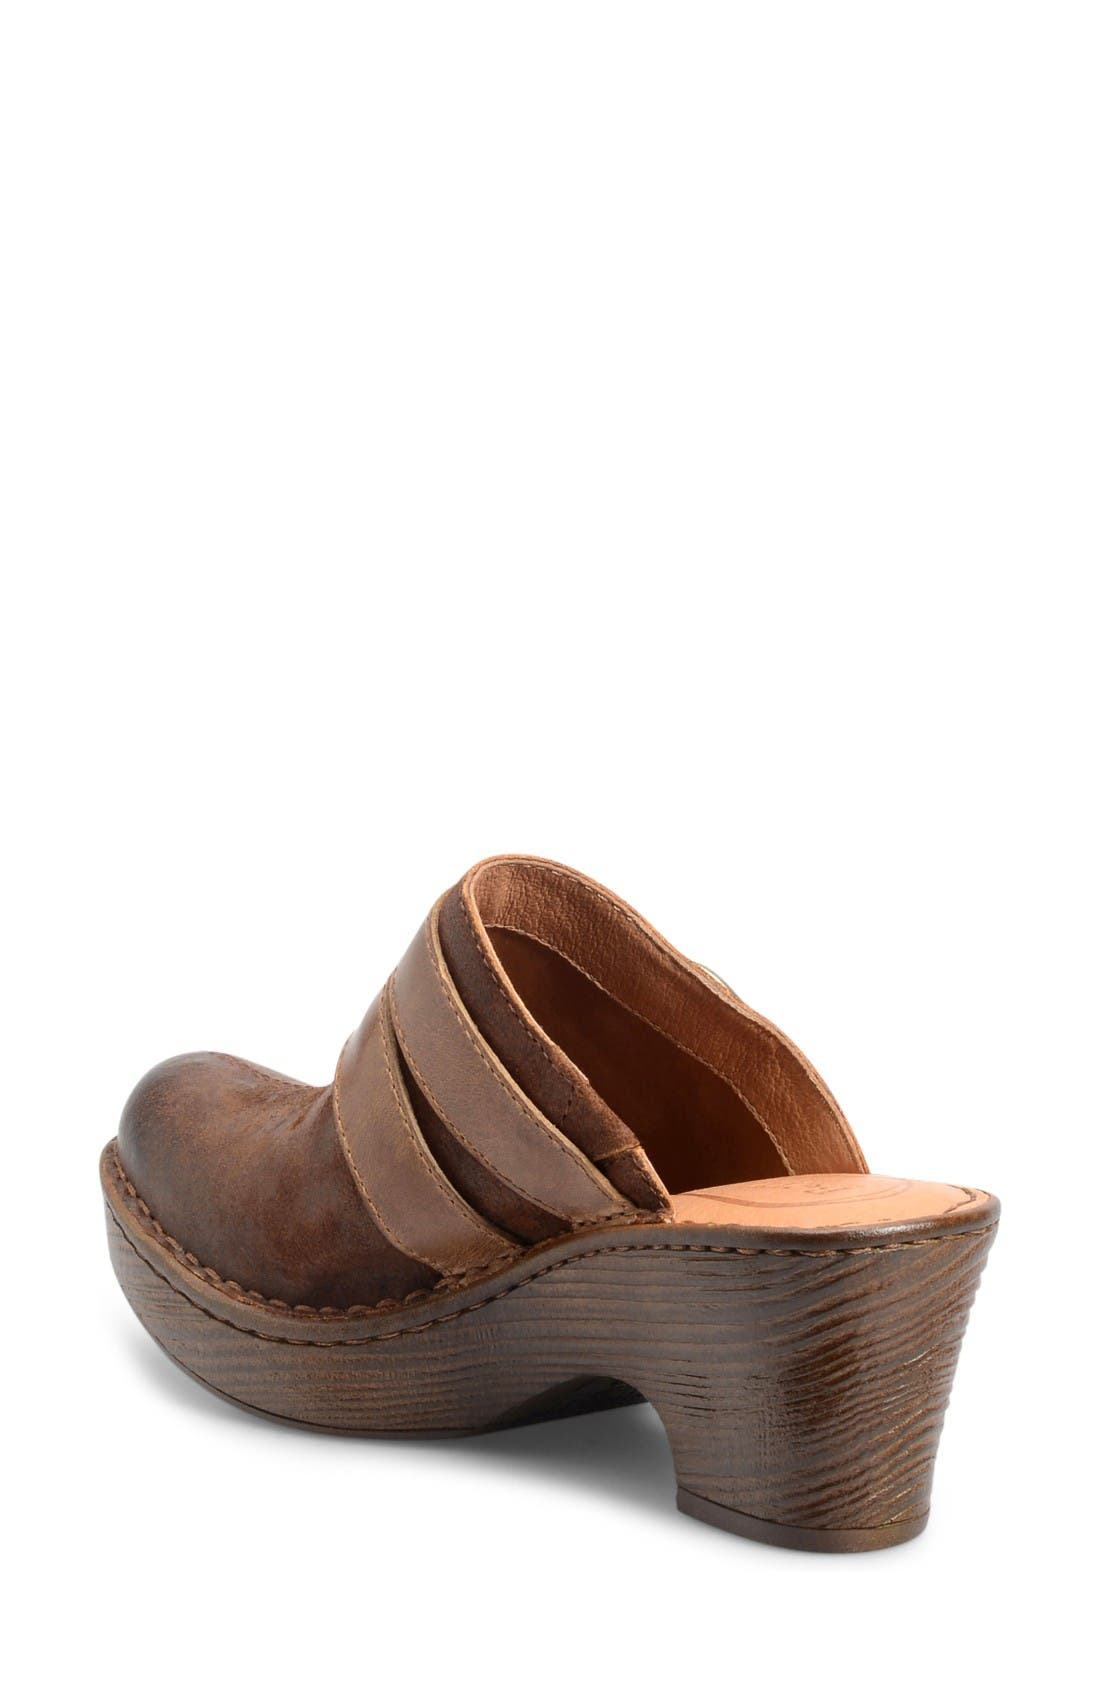 Laura Platform Clog,                             Alternate thumbnail 2, color,                             Rust Leather